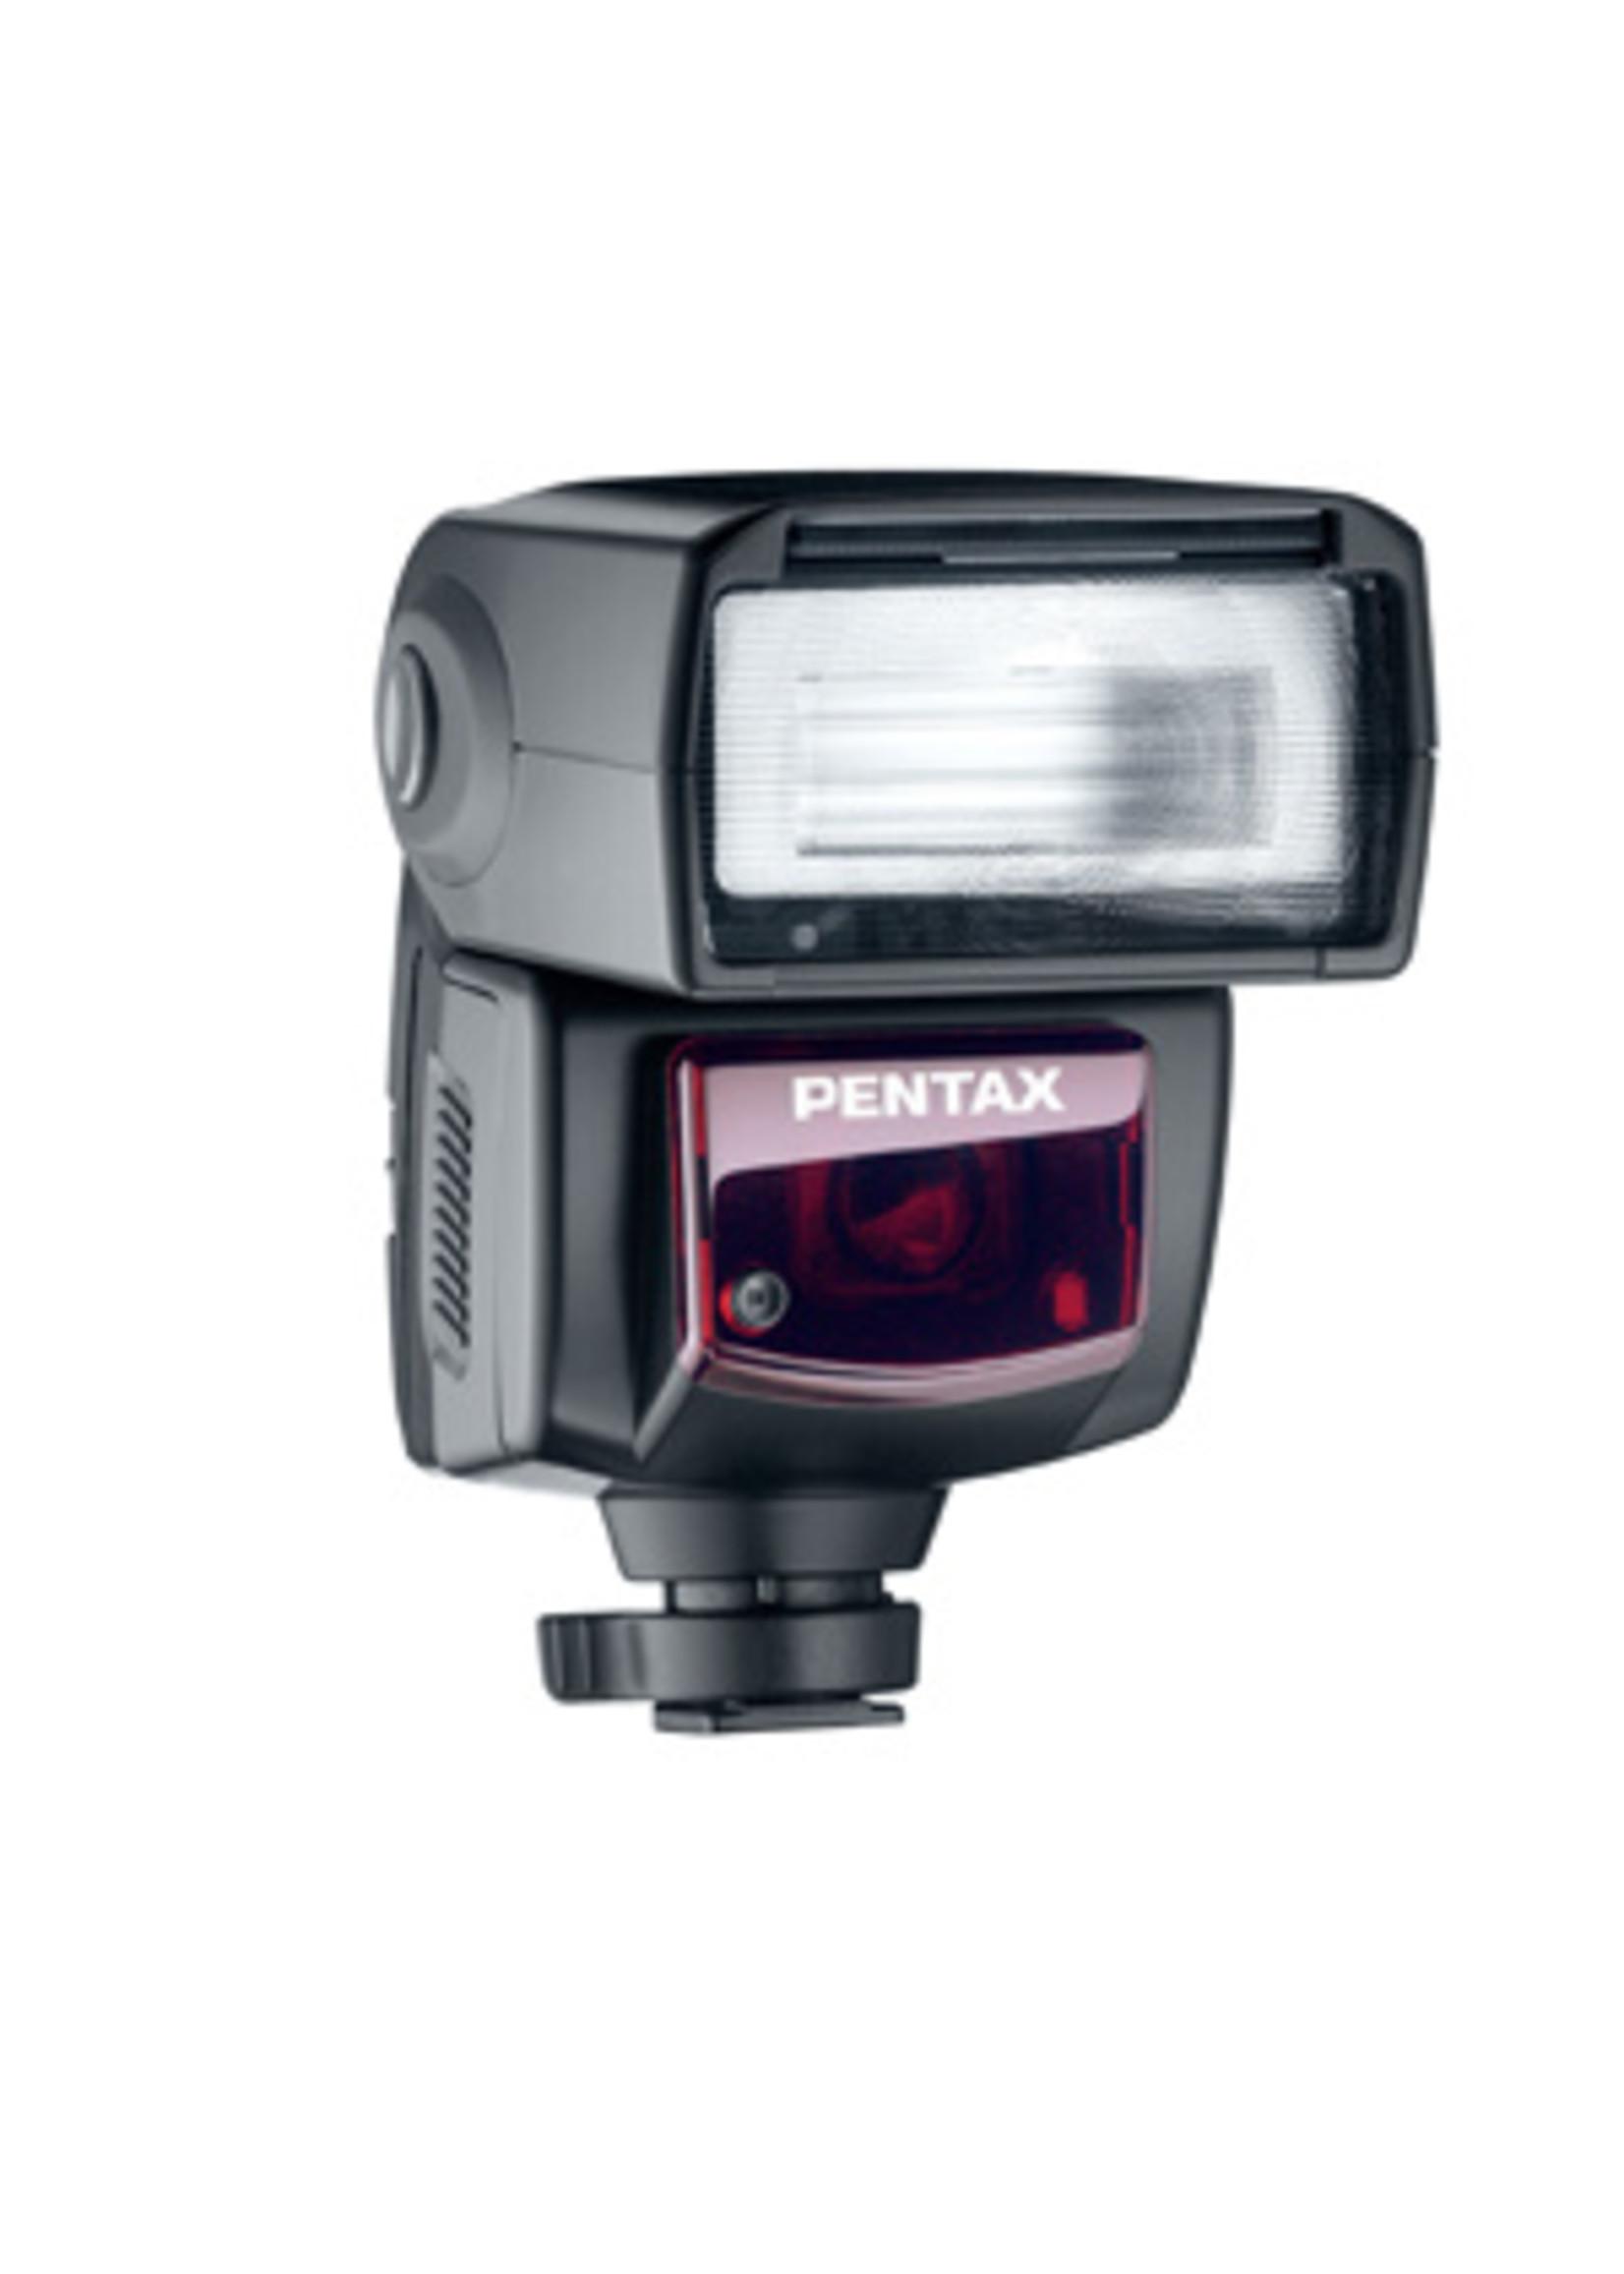 Pentax Pentax AF360FGZ Flash